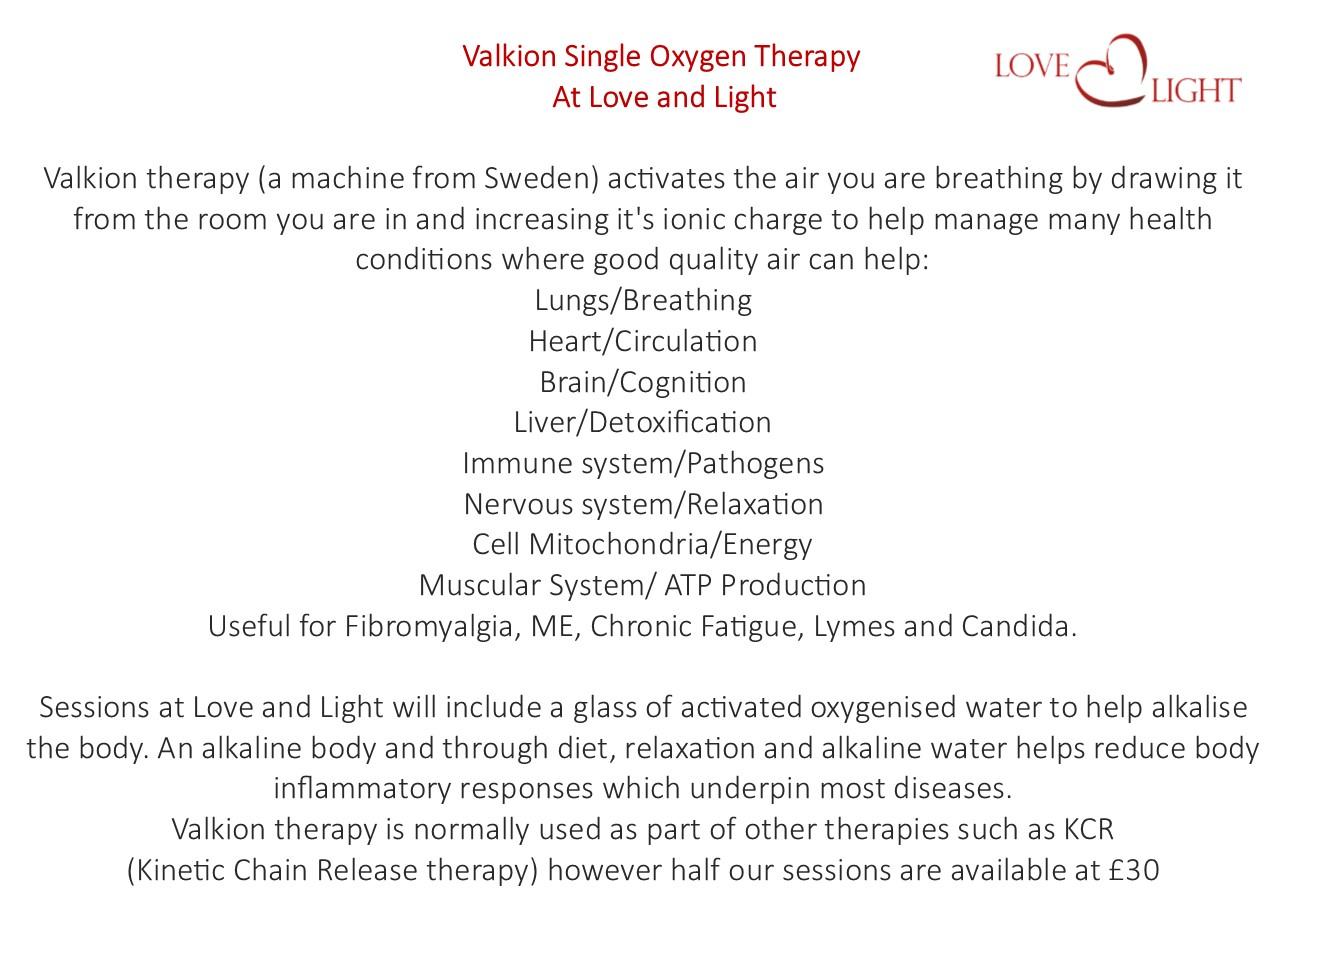 mark valk oxygen therapy